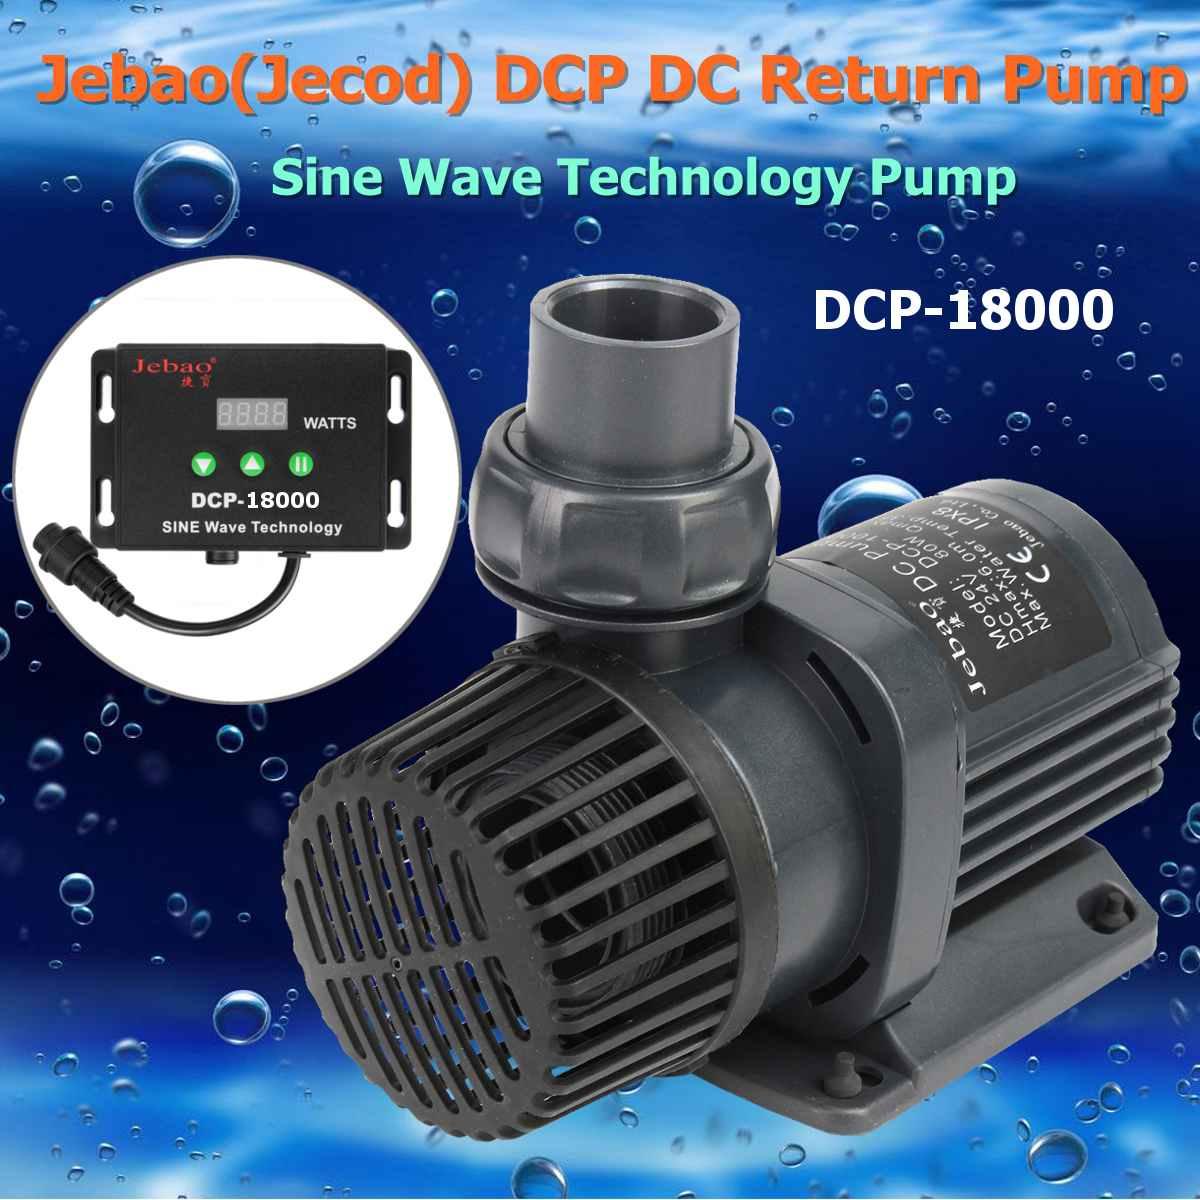 Jebao/Jecod DCP Series 3500-20000 Maring Flow Rate DC Sine Wave Return Submersible Water Pump